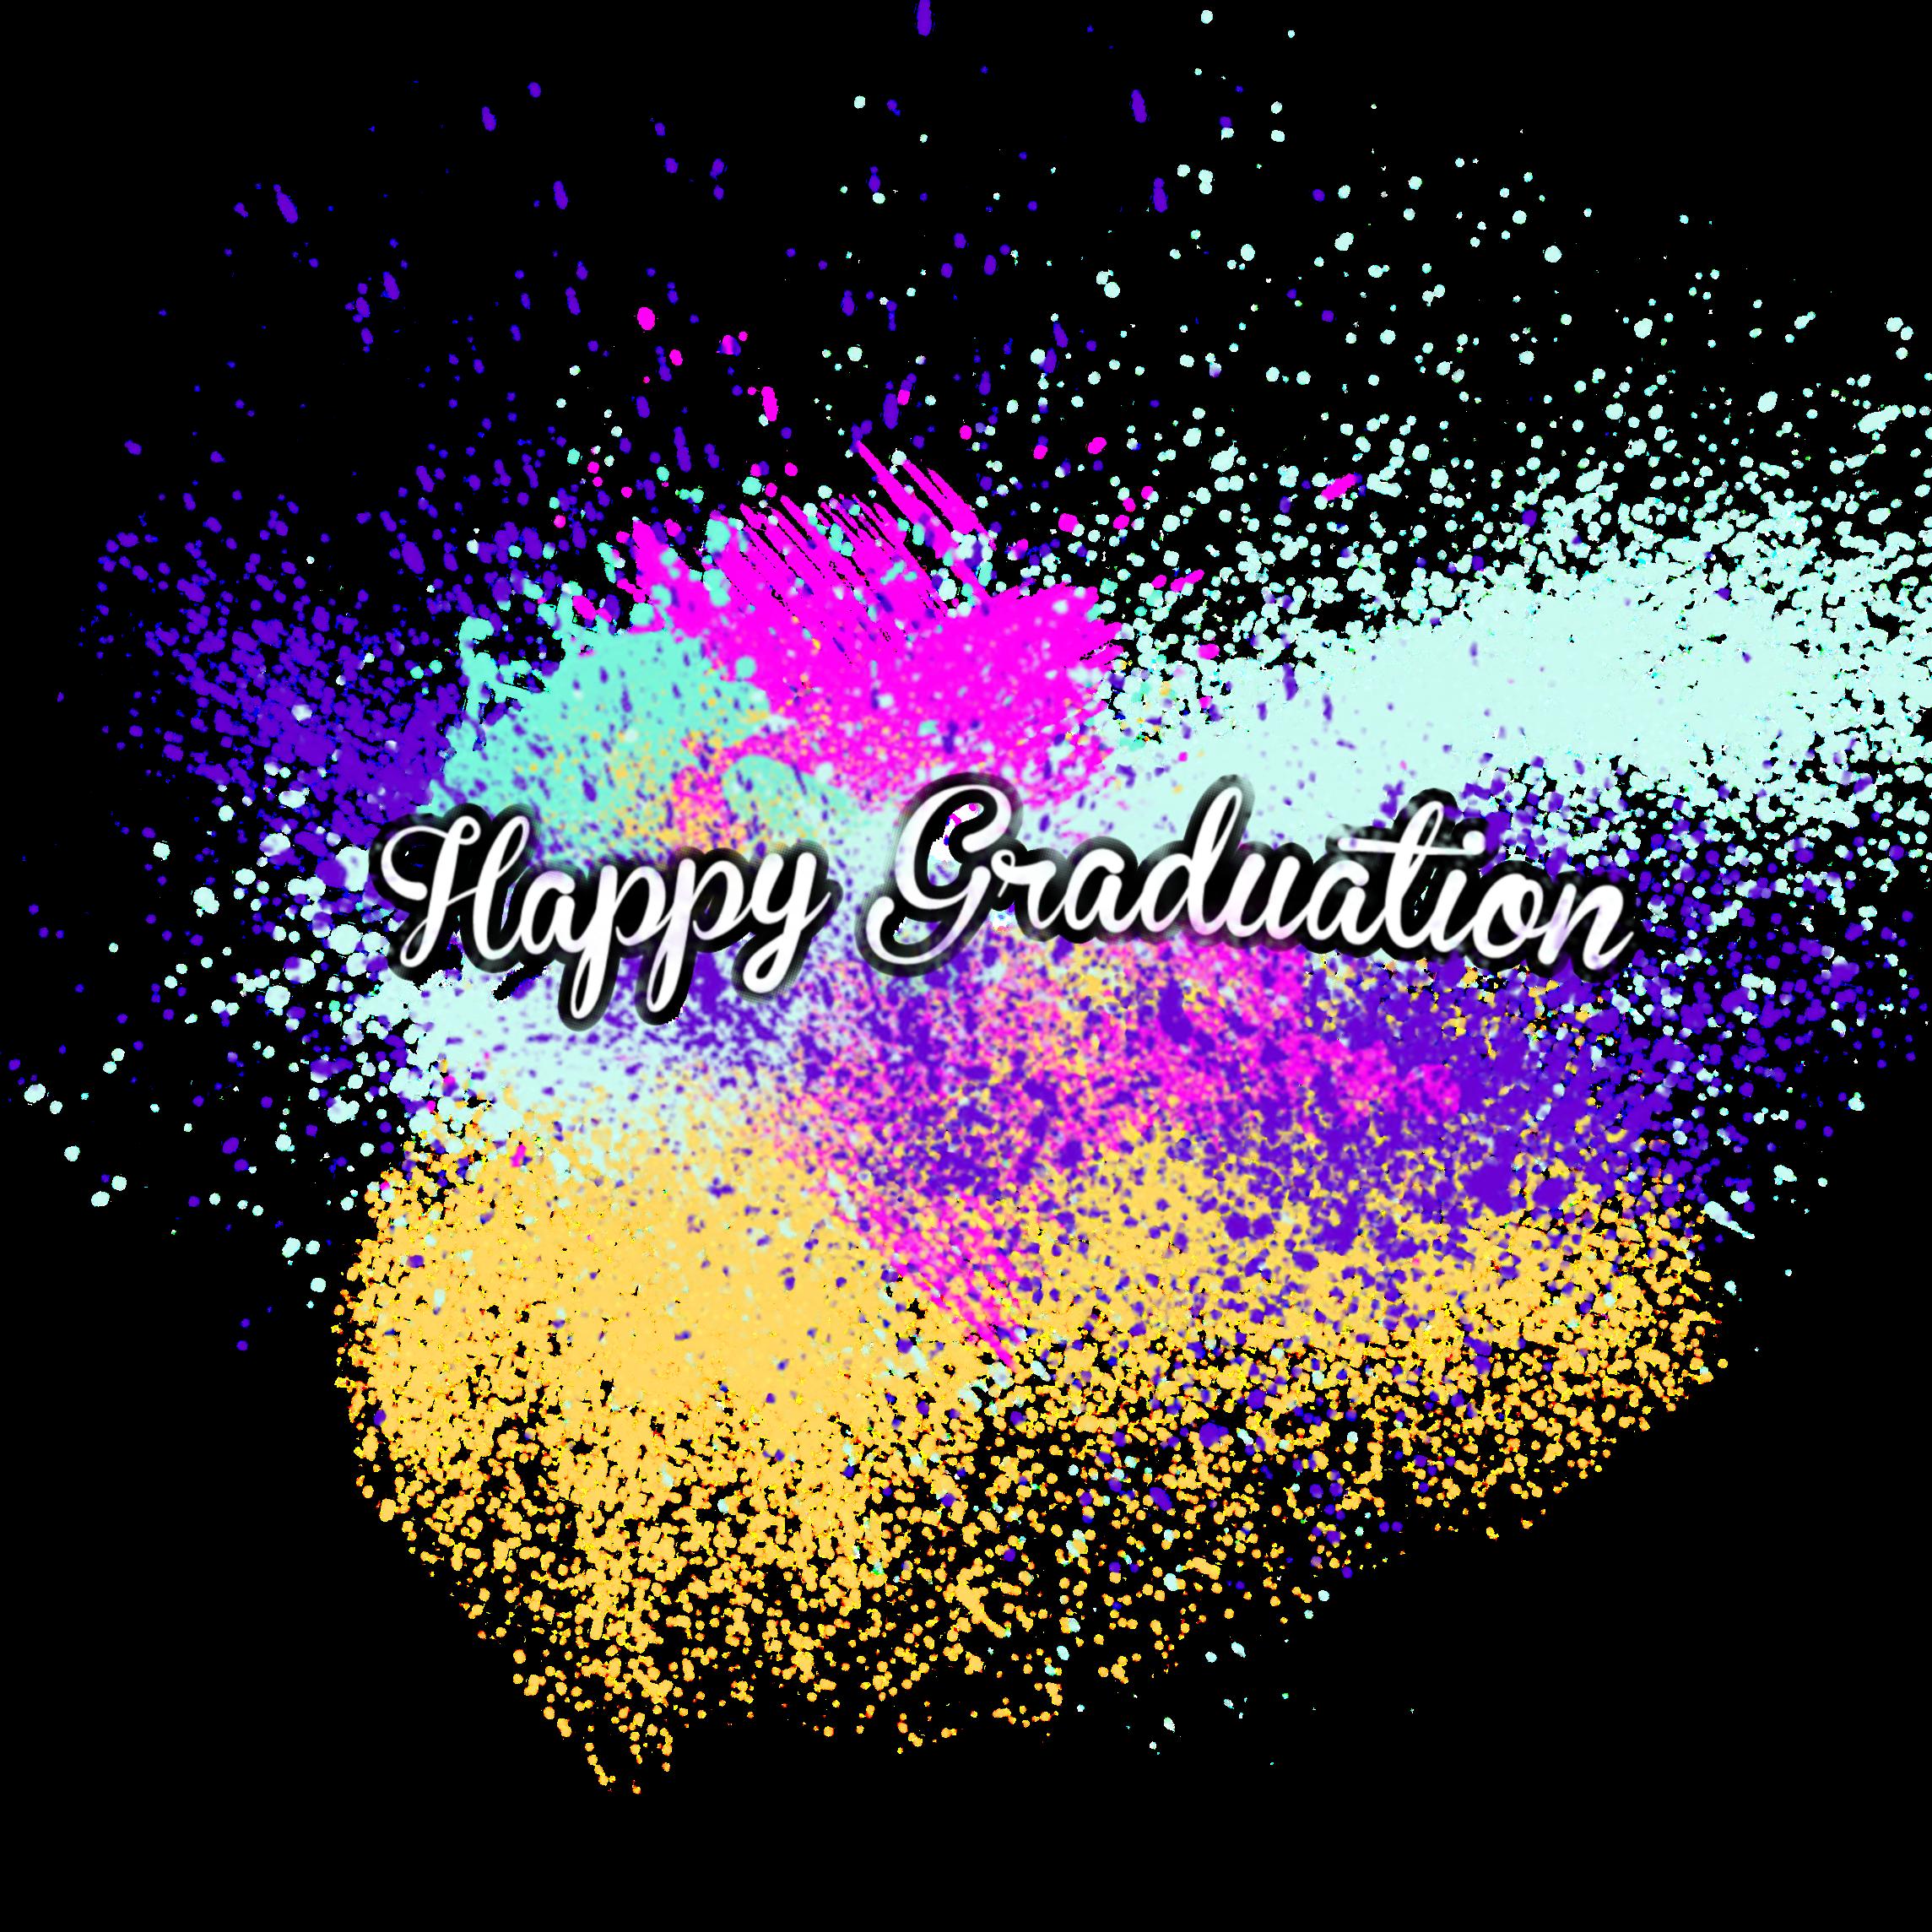 graduation happygraduation splashcolor wisuda congratul